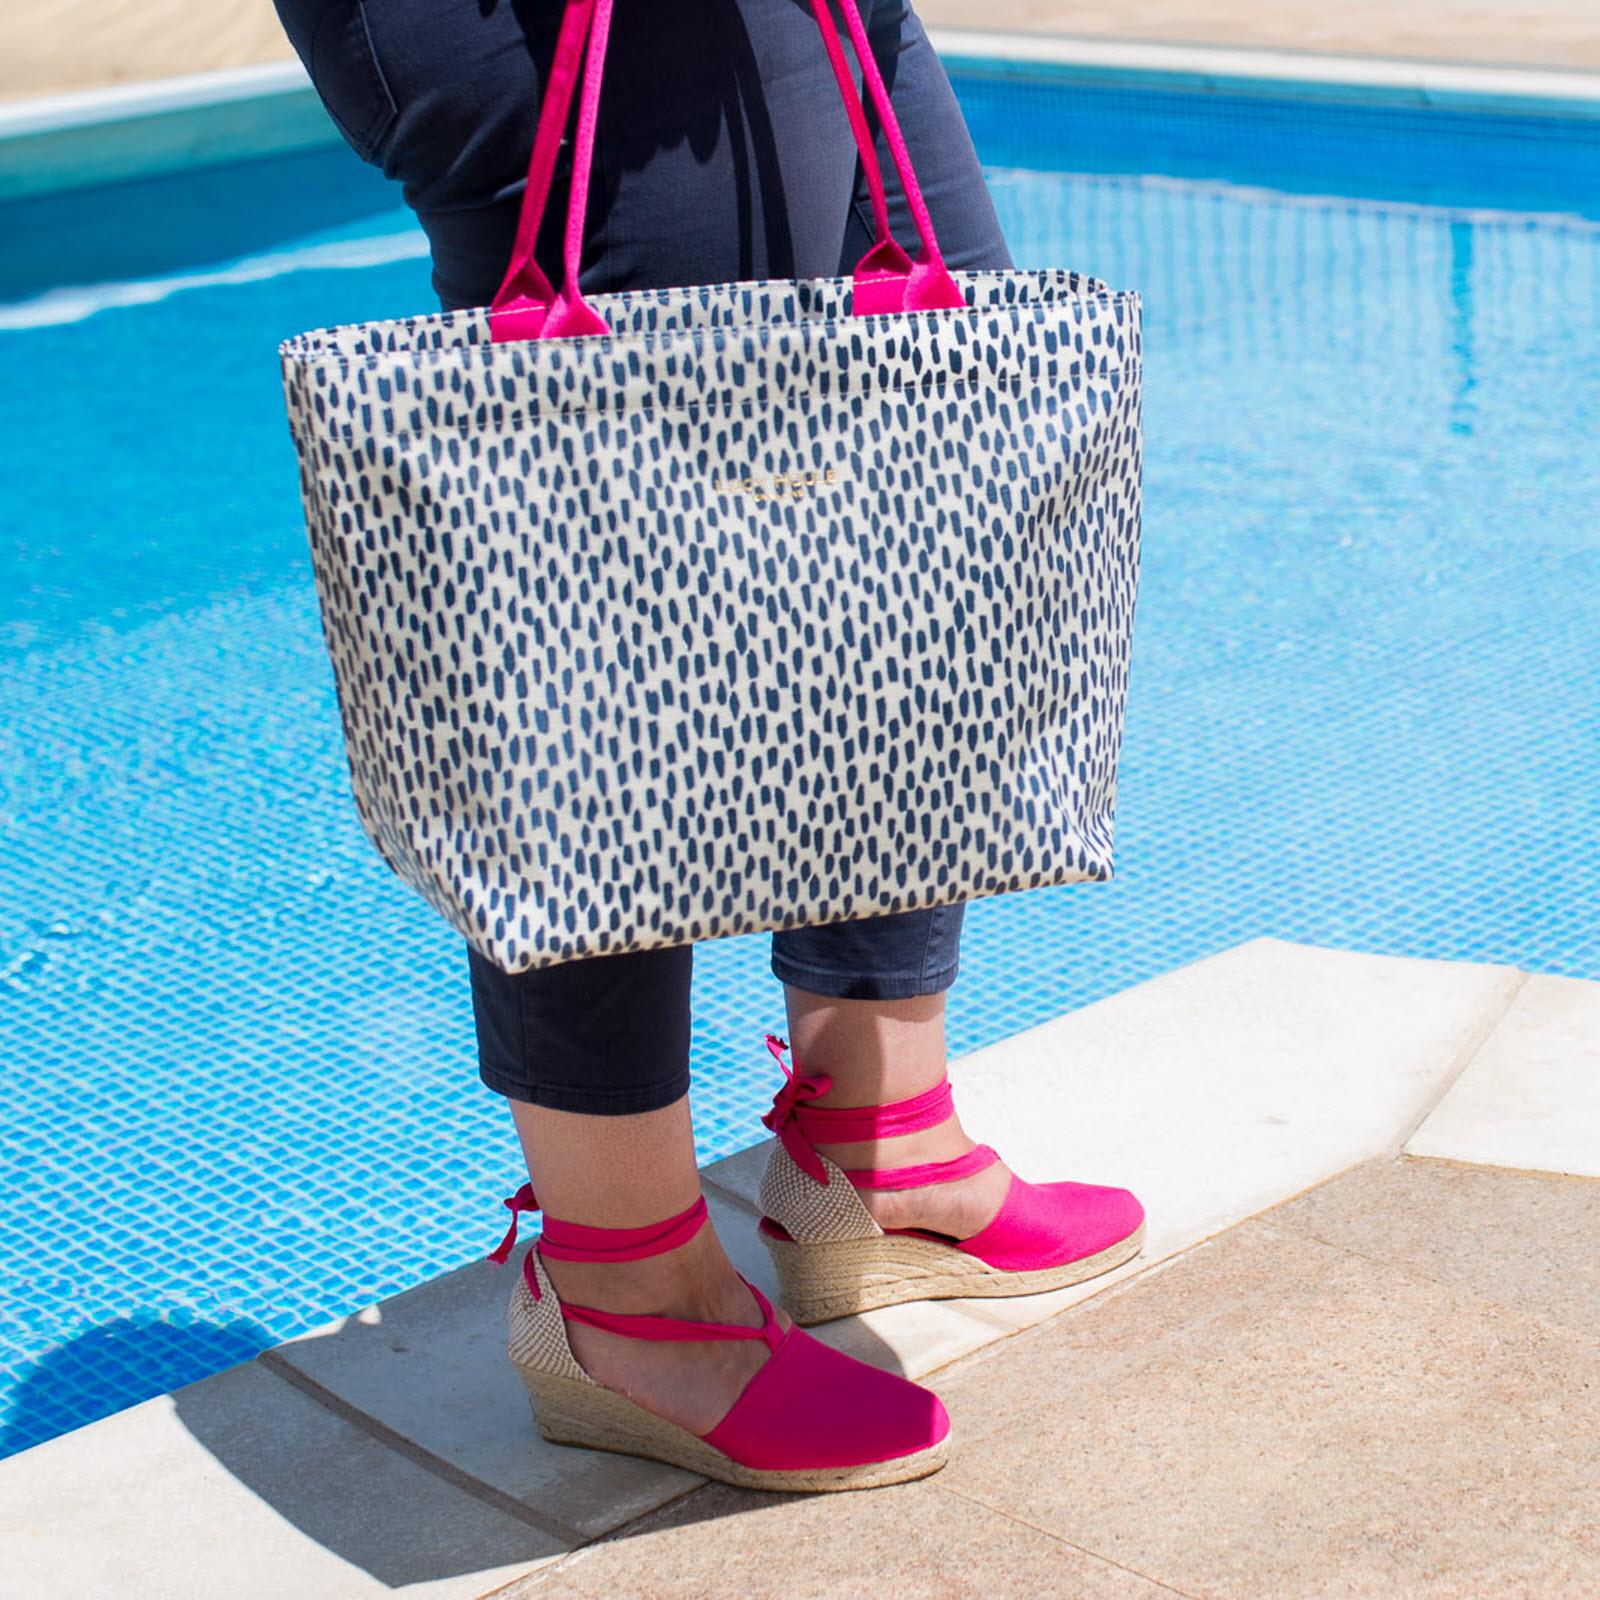 Navy Cobblestone Medium Zip Tote Bag with Pink Handles